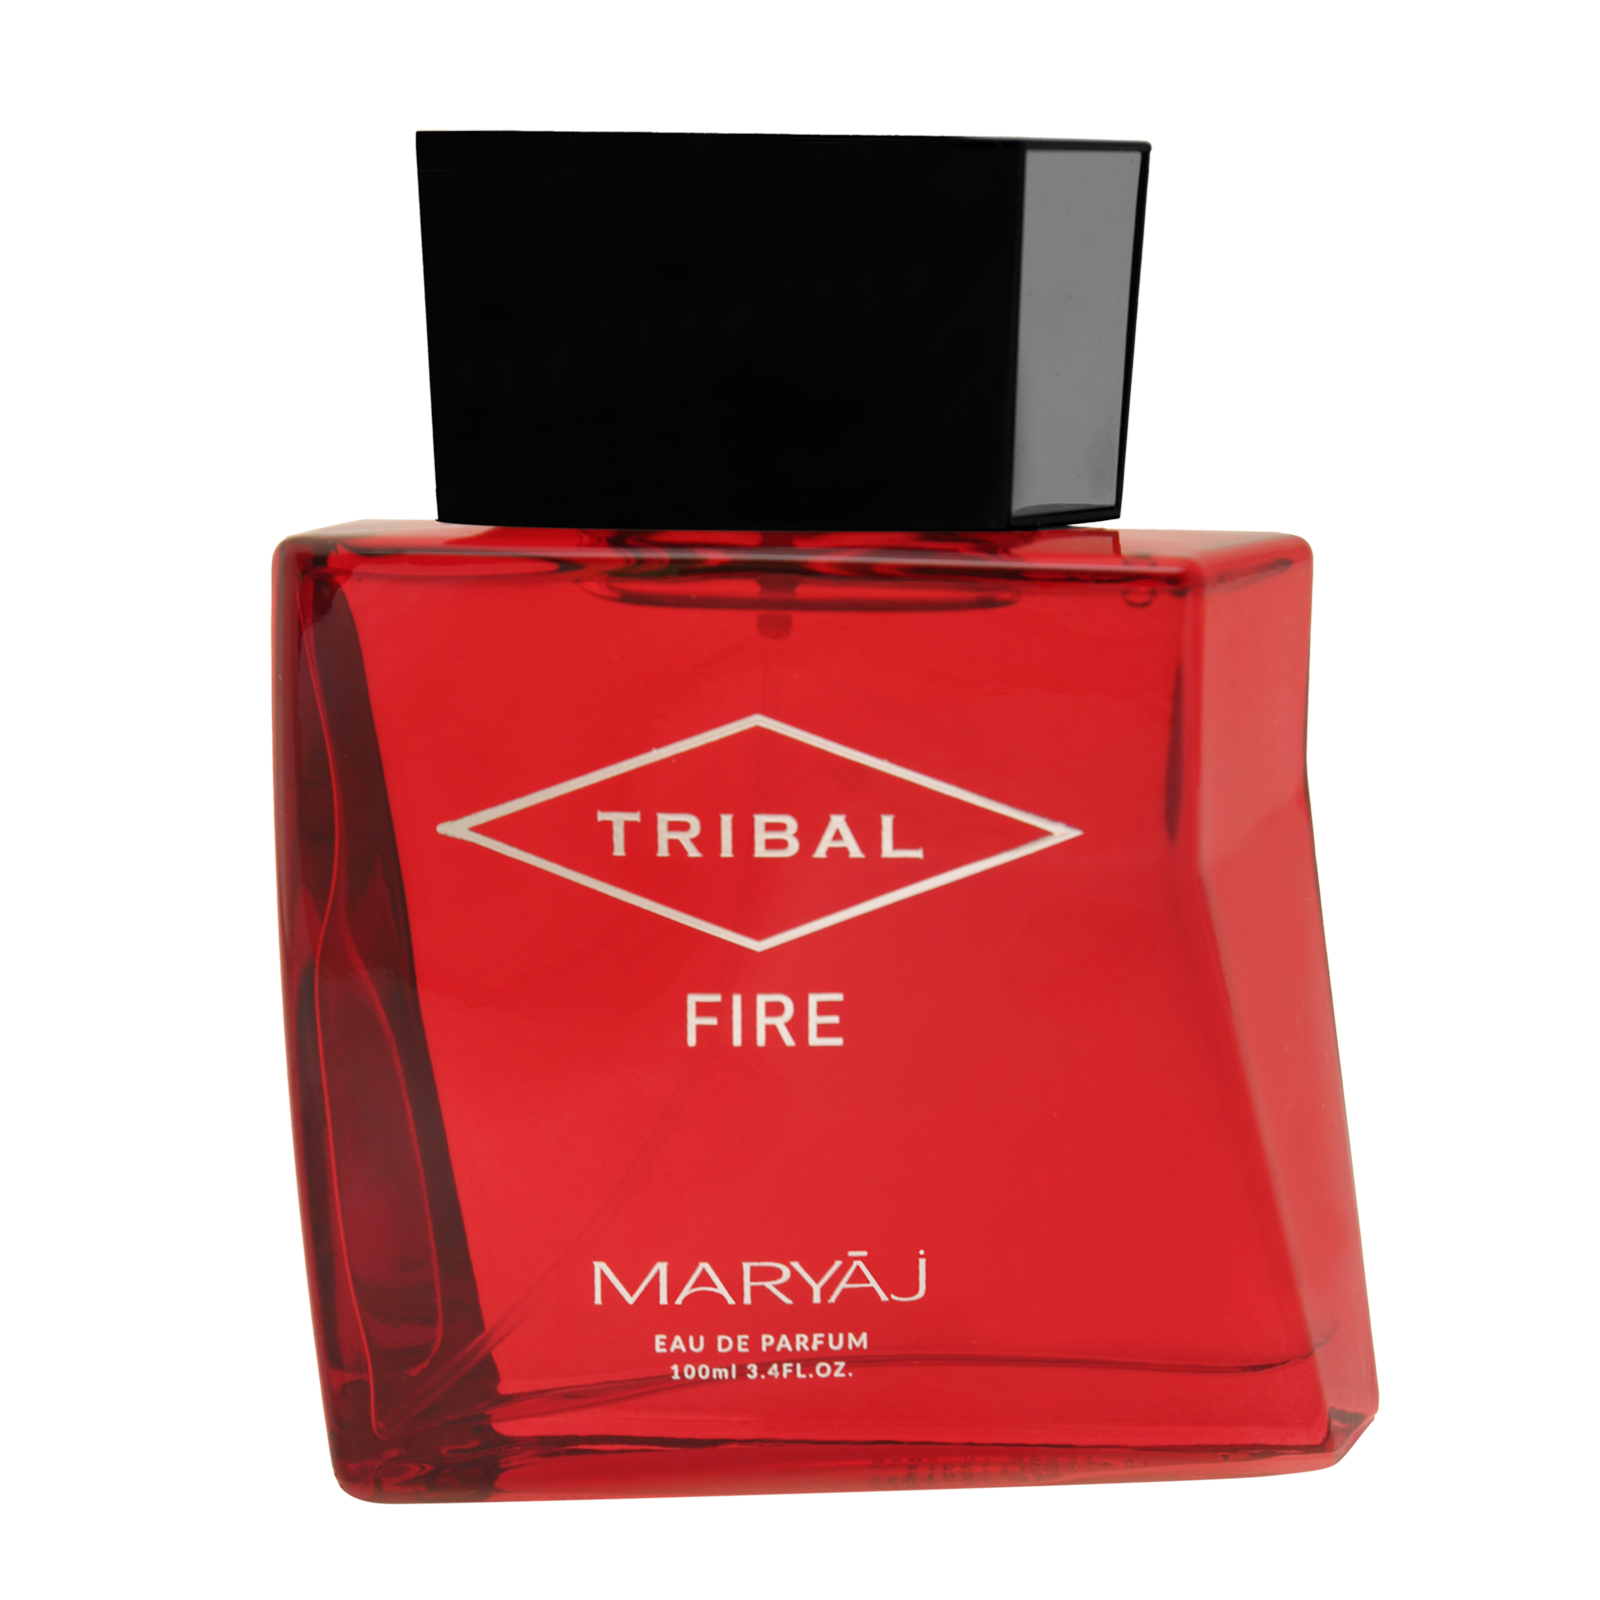 Maryaj | TRIBAL FIRE For Unisex EAU DE PARFUME 100ML